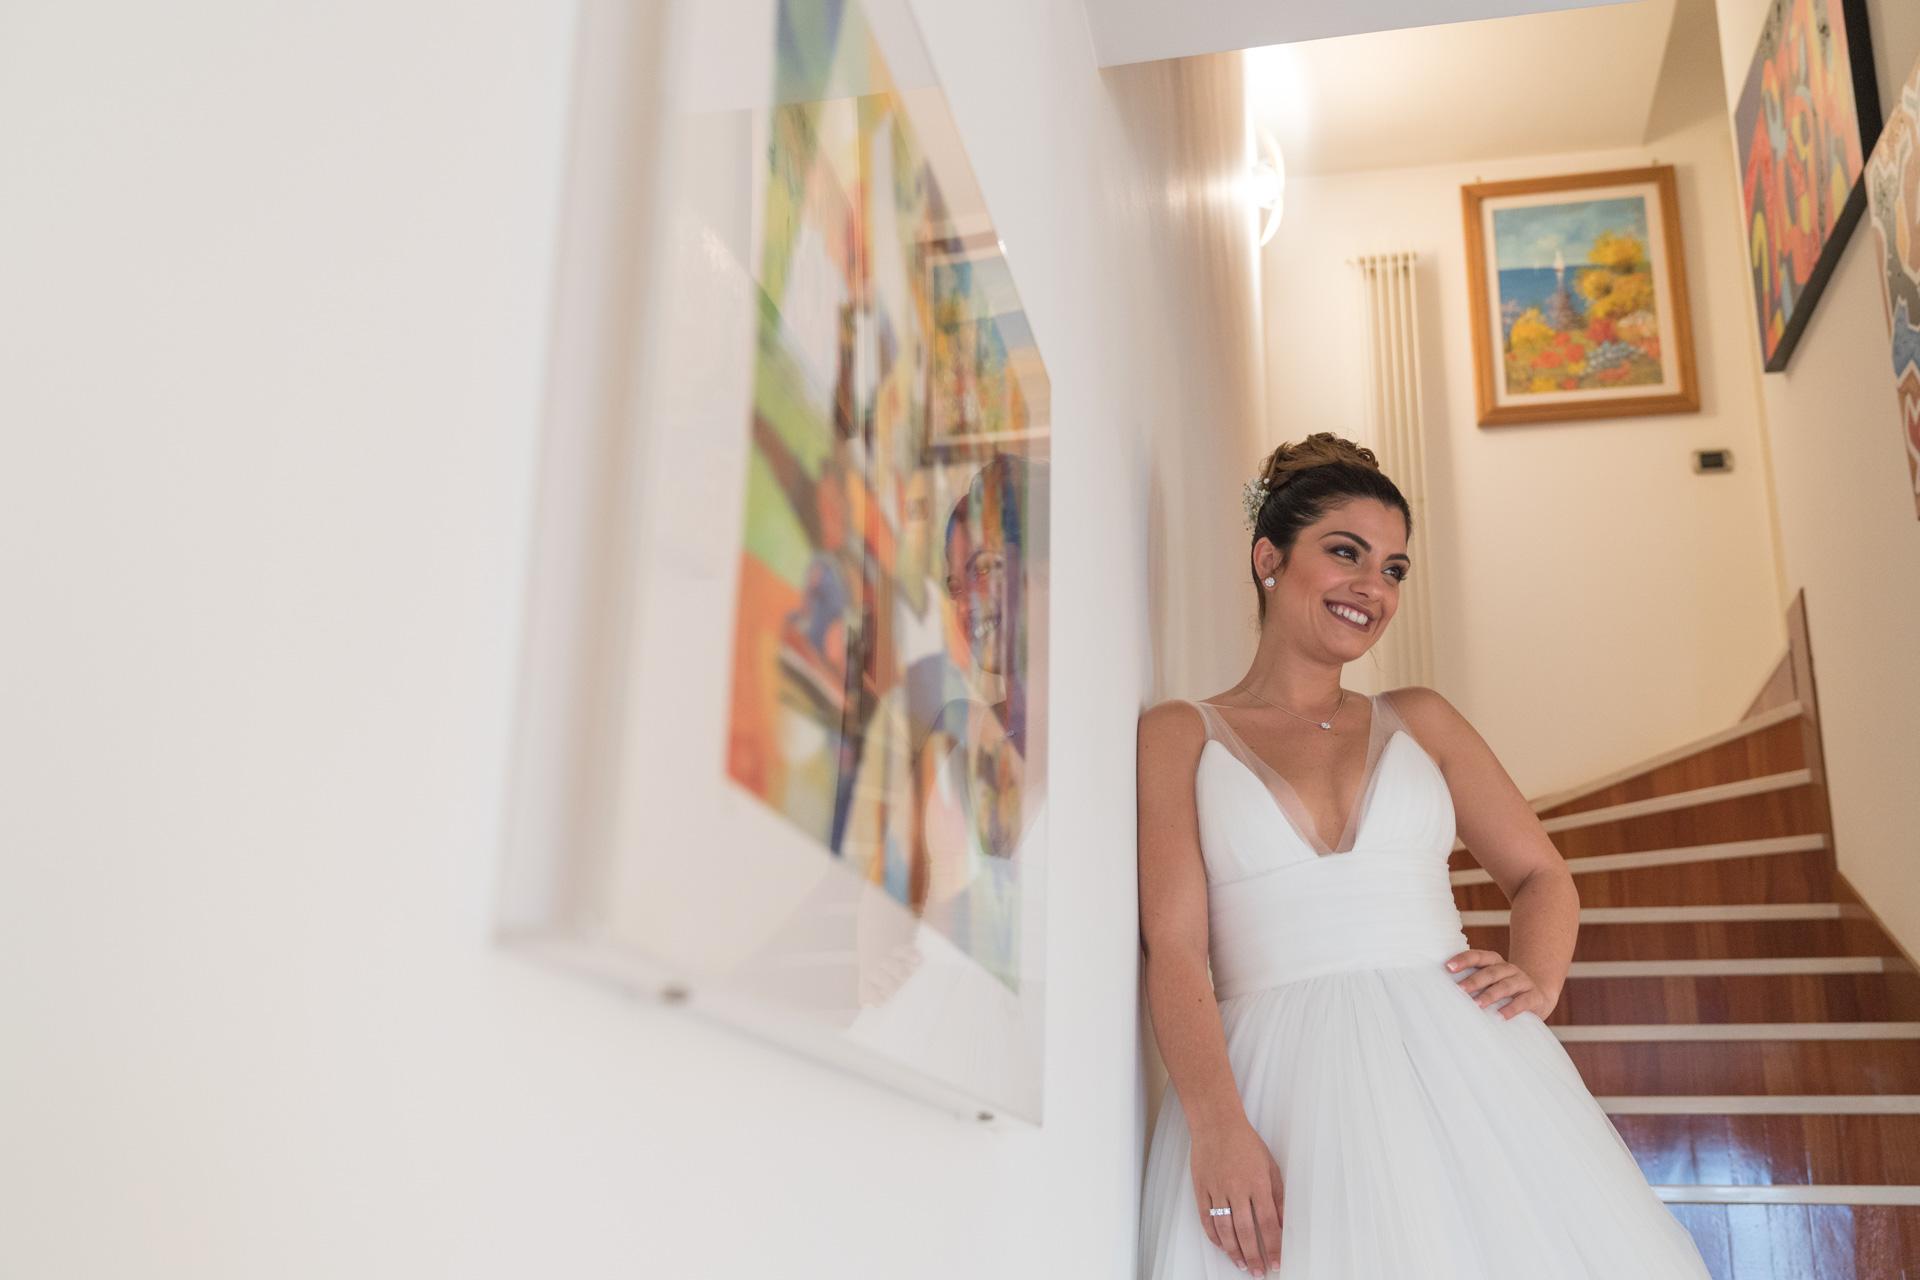 merafina photographer alfonso merafina fotografo wedding matrimonio andria francesca e antonio (5)